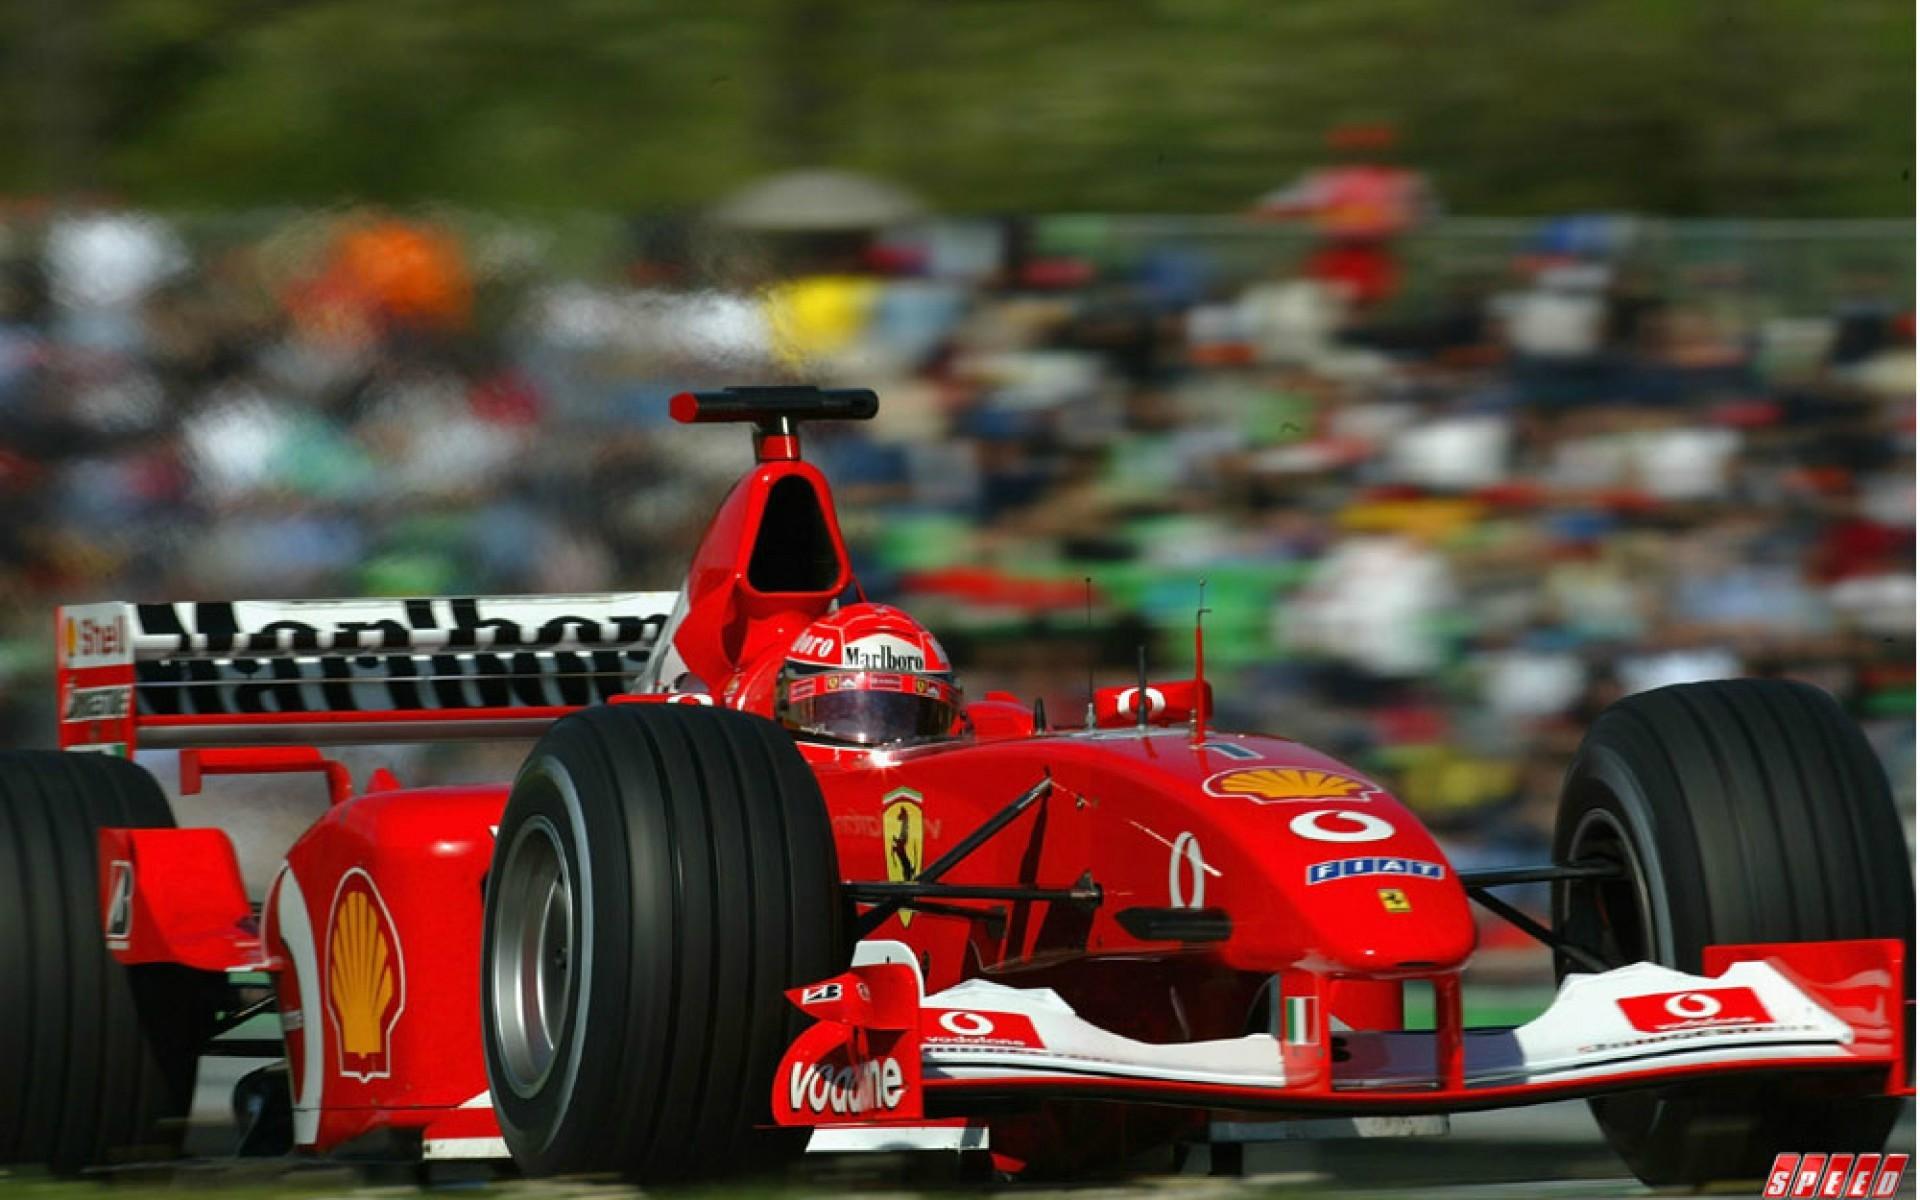 Schumacher A Twitter Pic by Alojzija Emer on WALLPORT